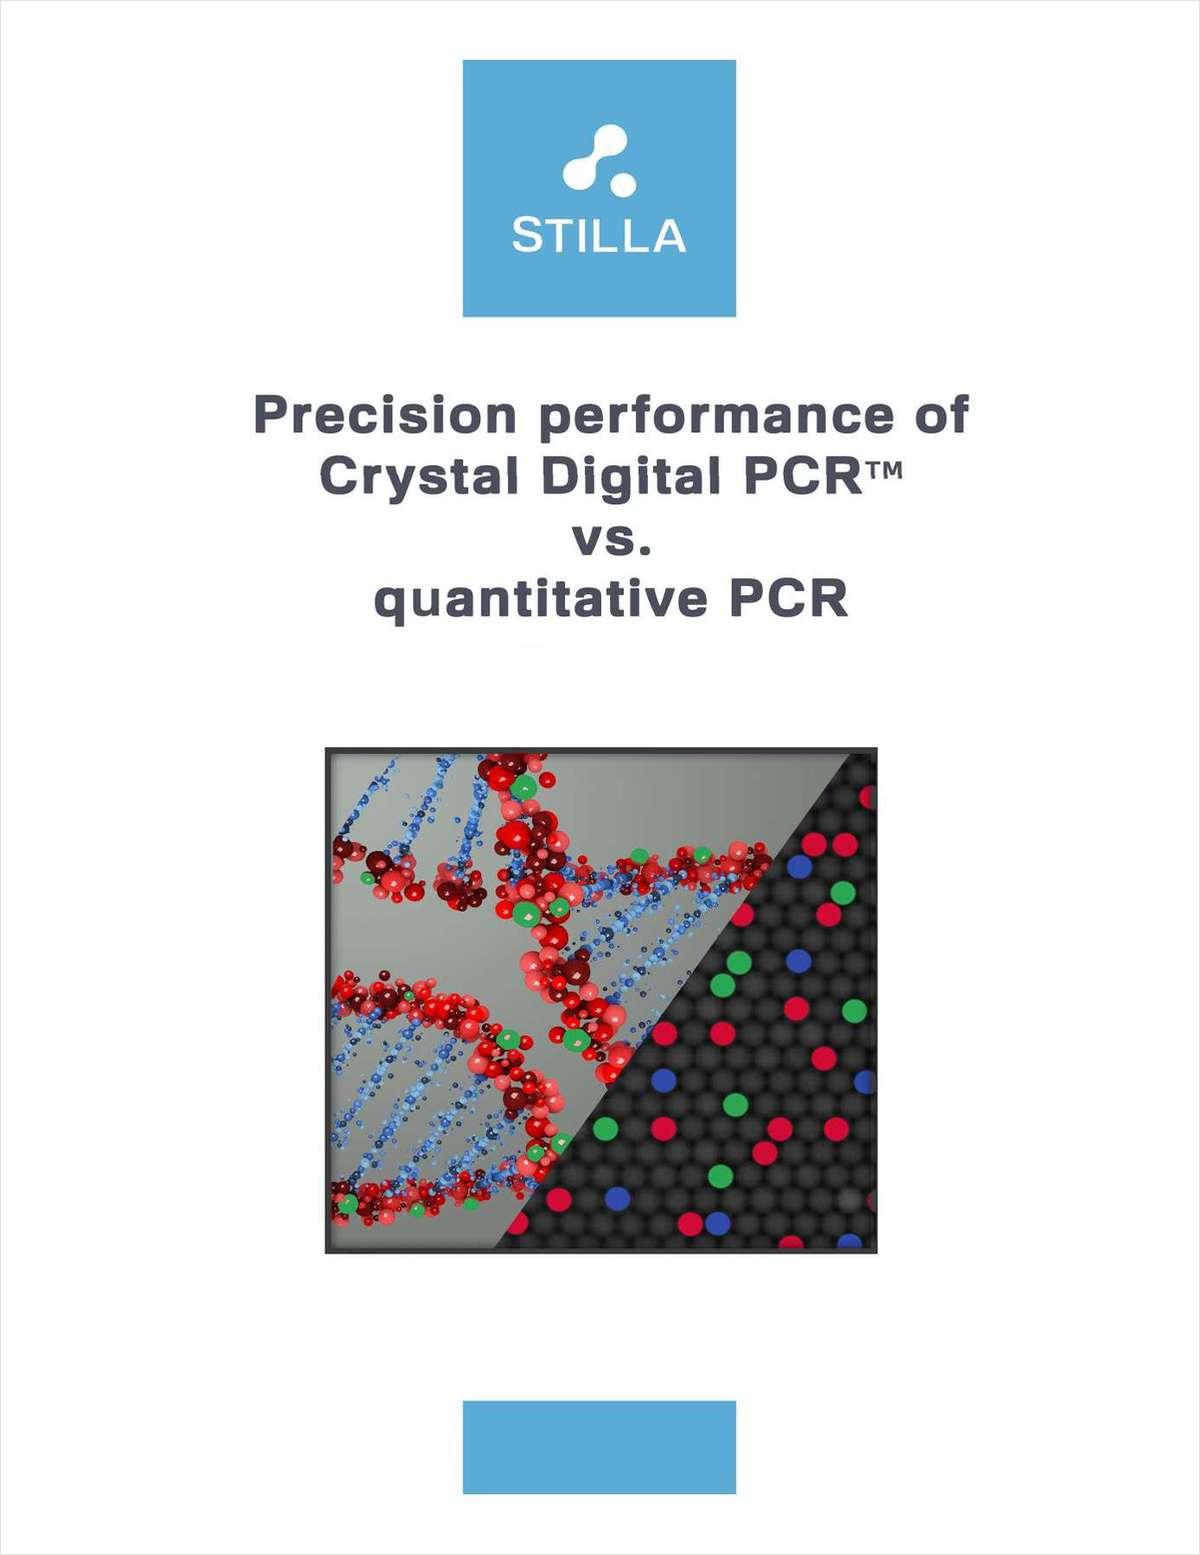 Precision Performance of Crystal Digital PCR vs. Quantitative PCR